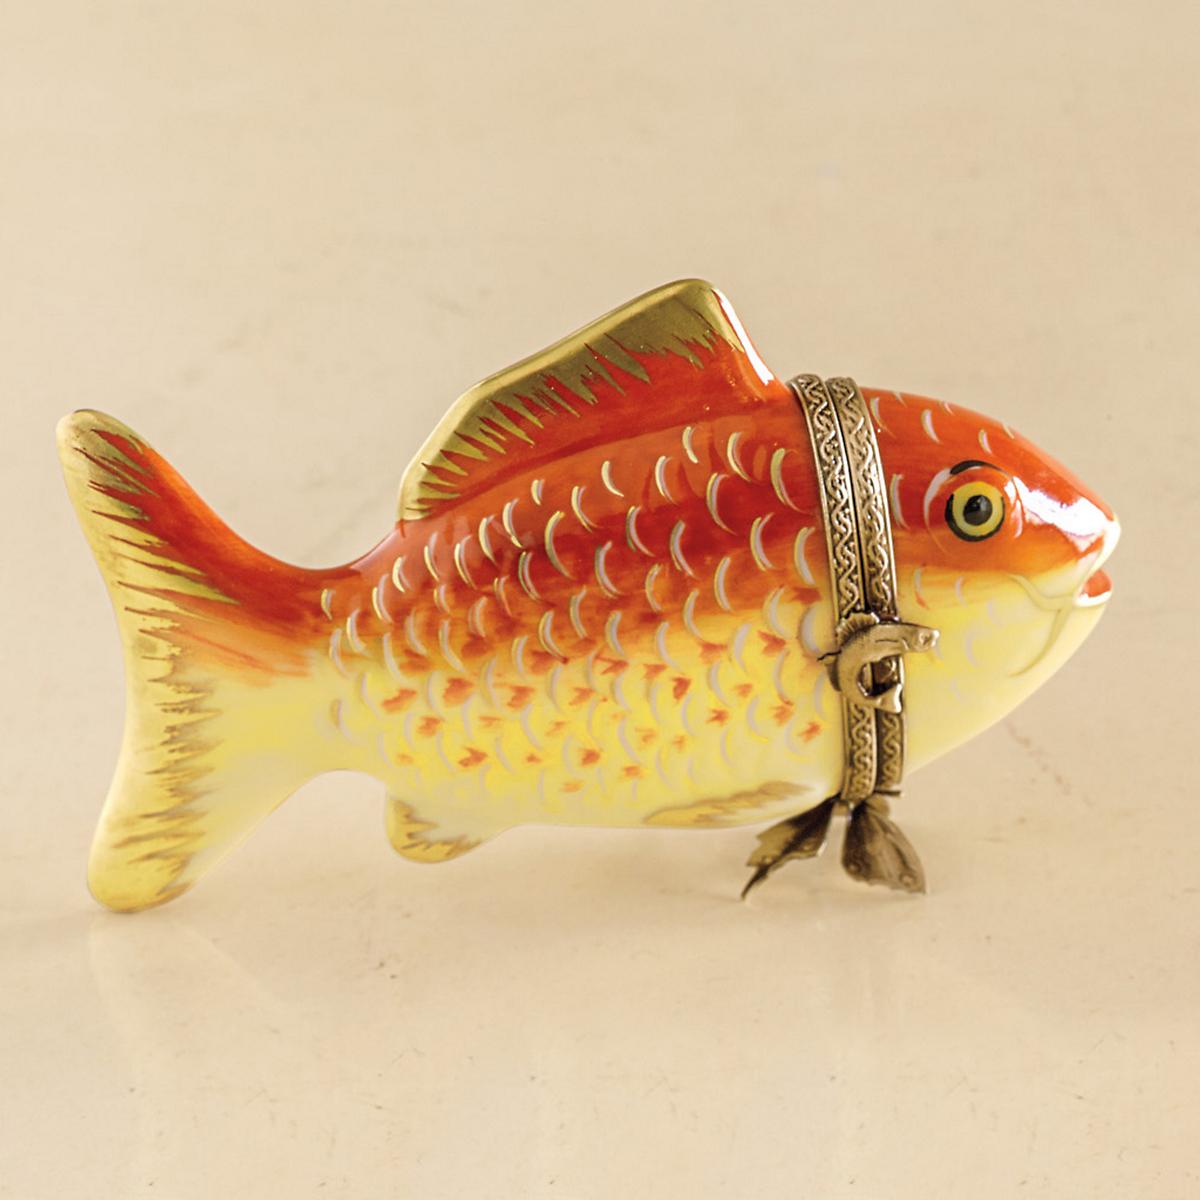 Limoges good fortune koi fish gump 39 s for Koi fish good luck